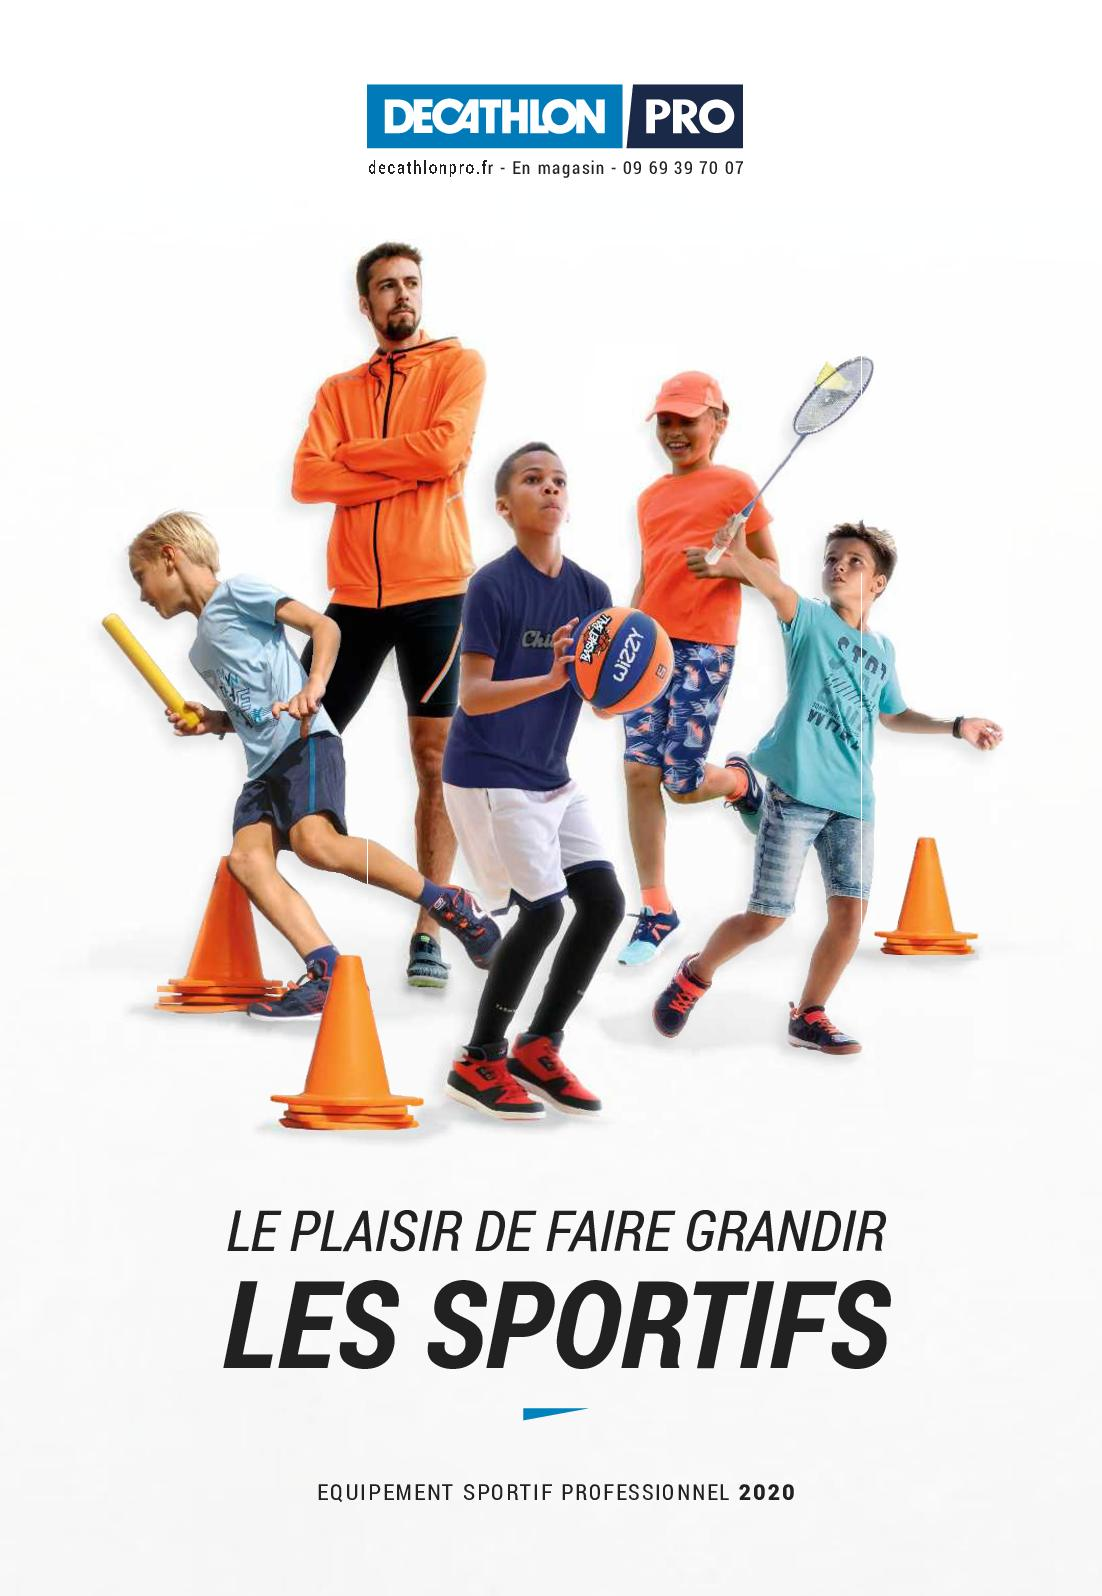 materiel sportif rentree 2020 decathlon pro